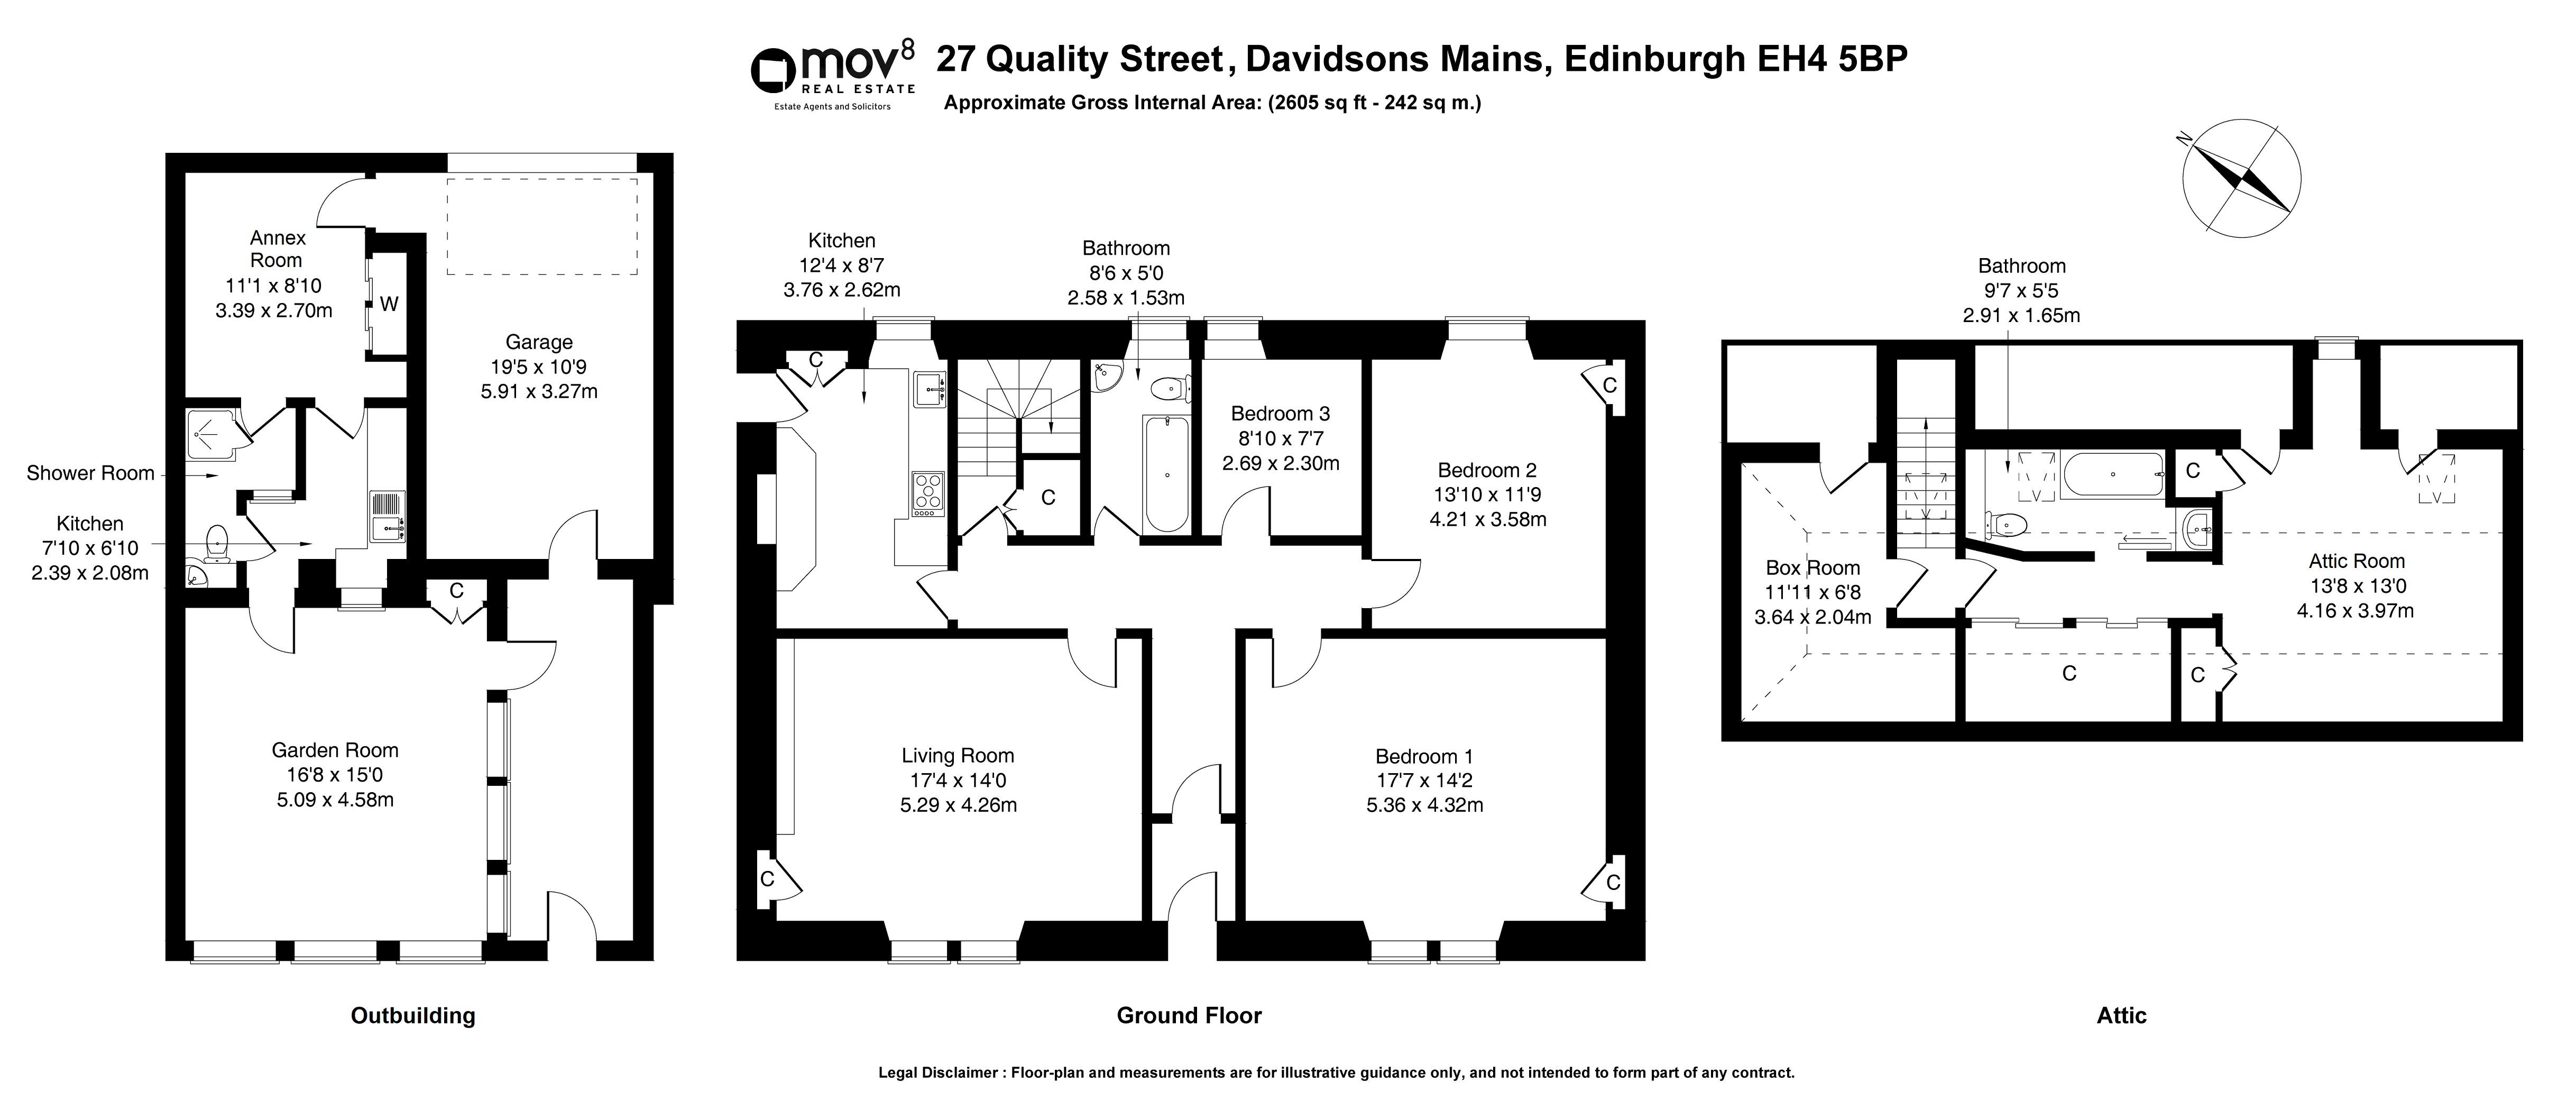 Floorplan 1 of 27 Quality Street, Davidsons Mains, Edinburgh, EH4 5BP